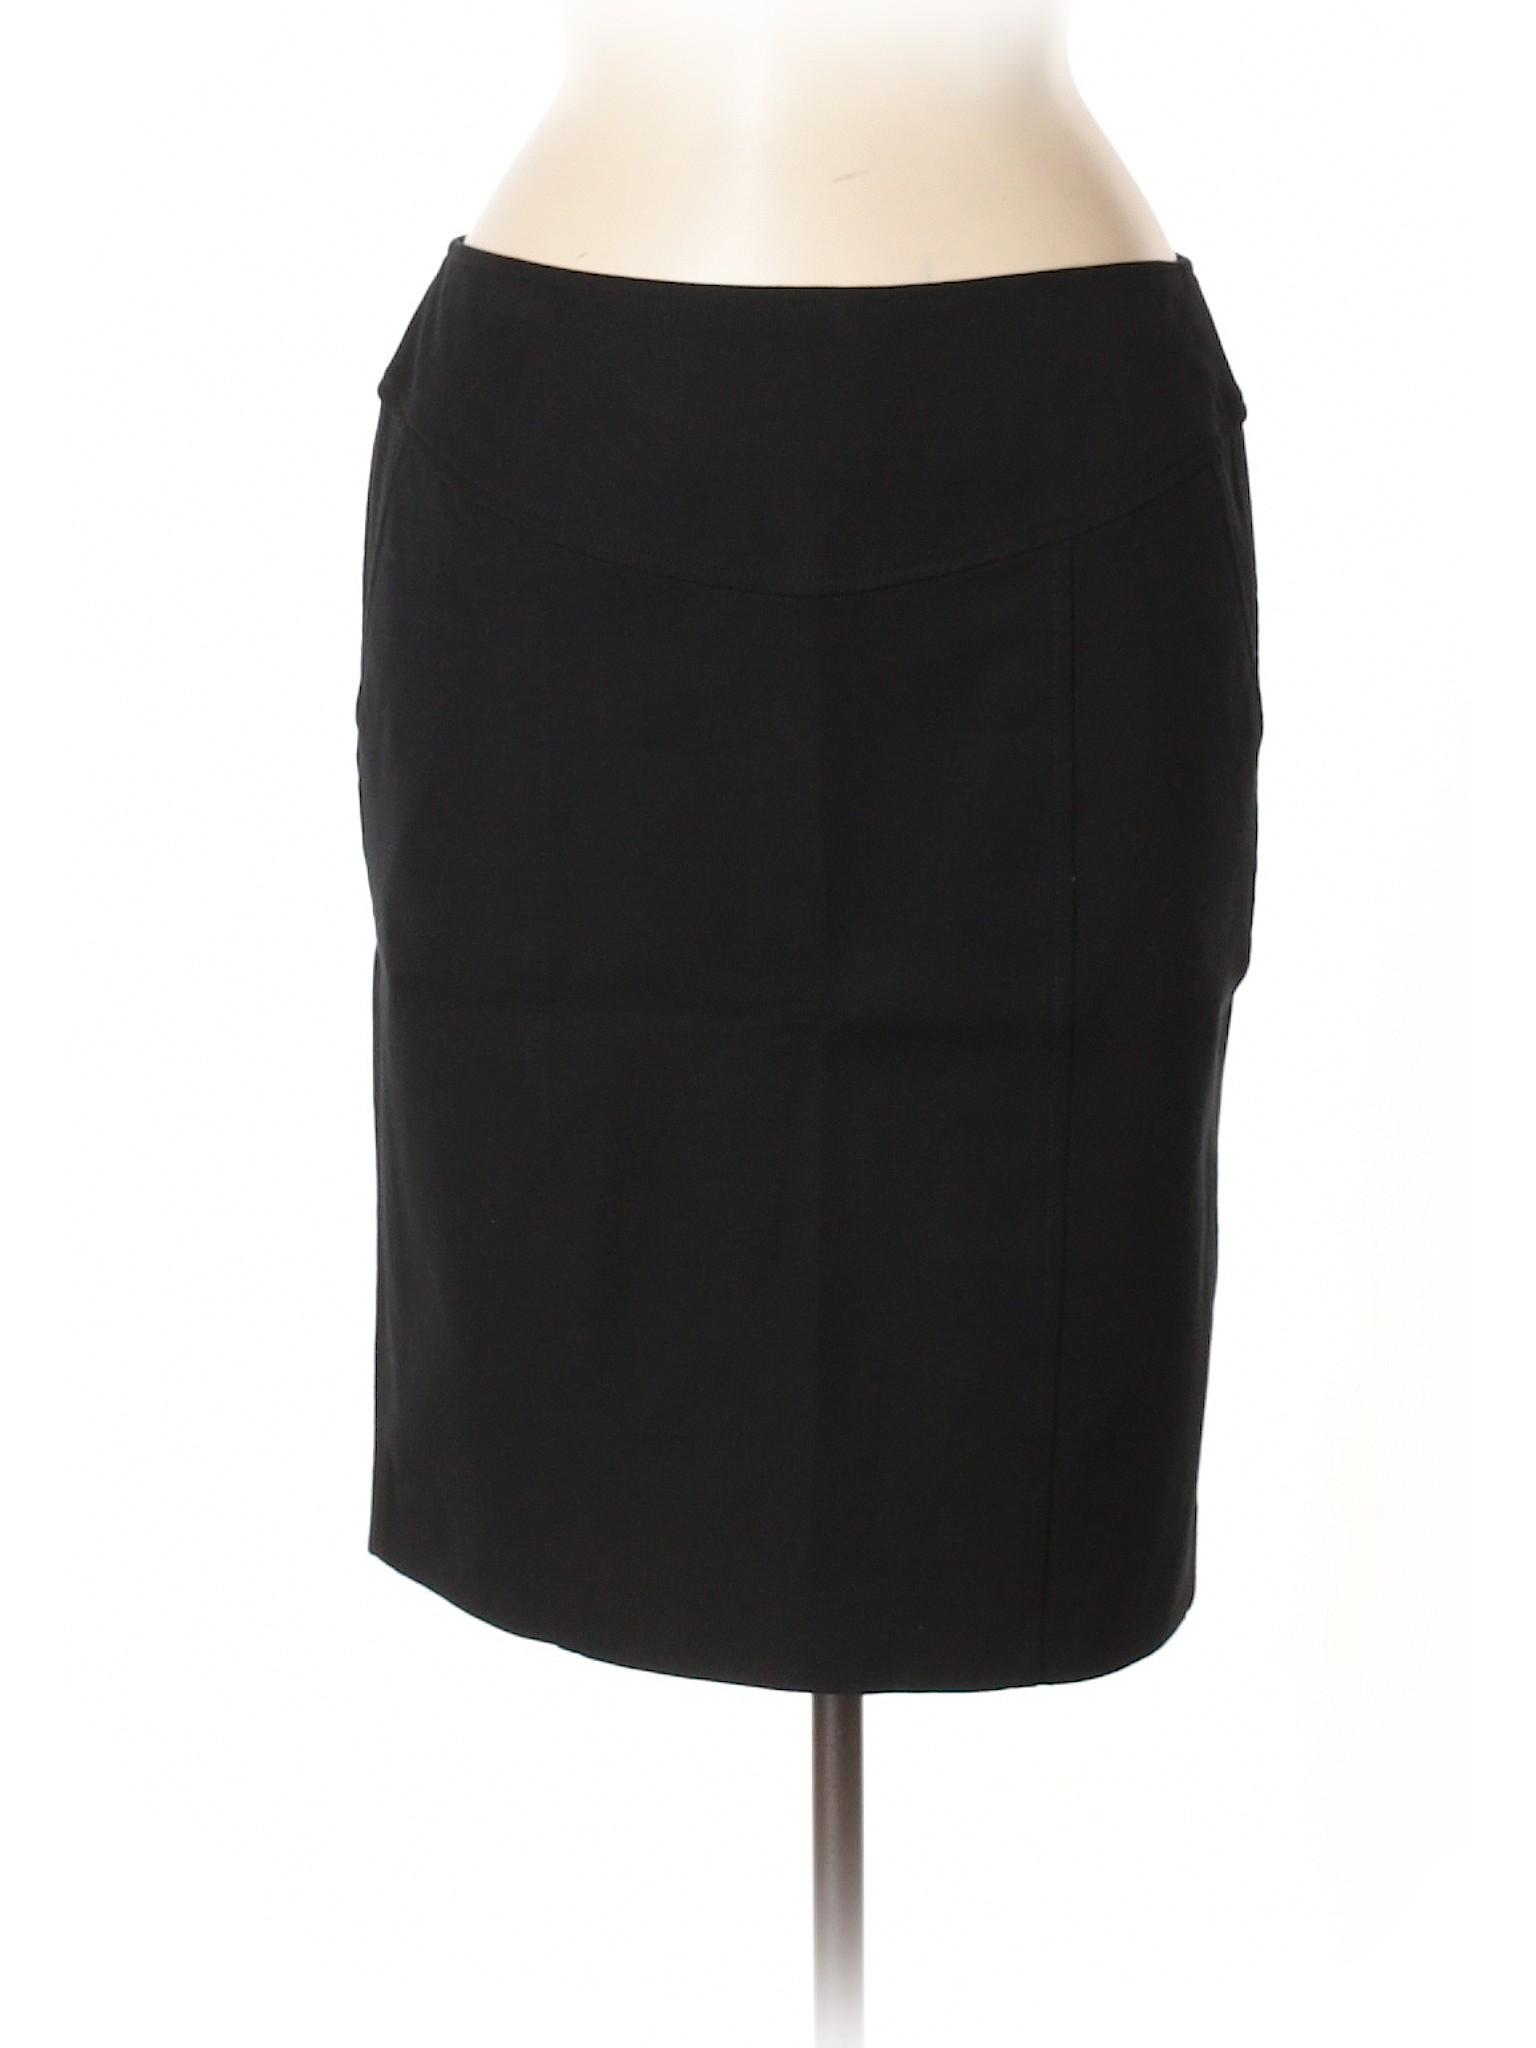 Casual Boutique Boutique Boutique Casual Skirt Skirt Casual Skirt Casual Boutique ABF488q